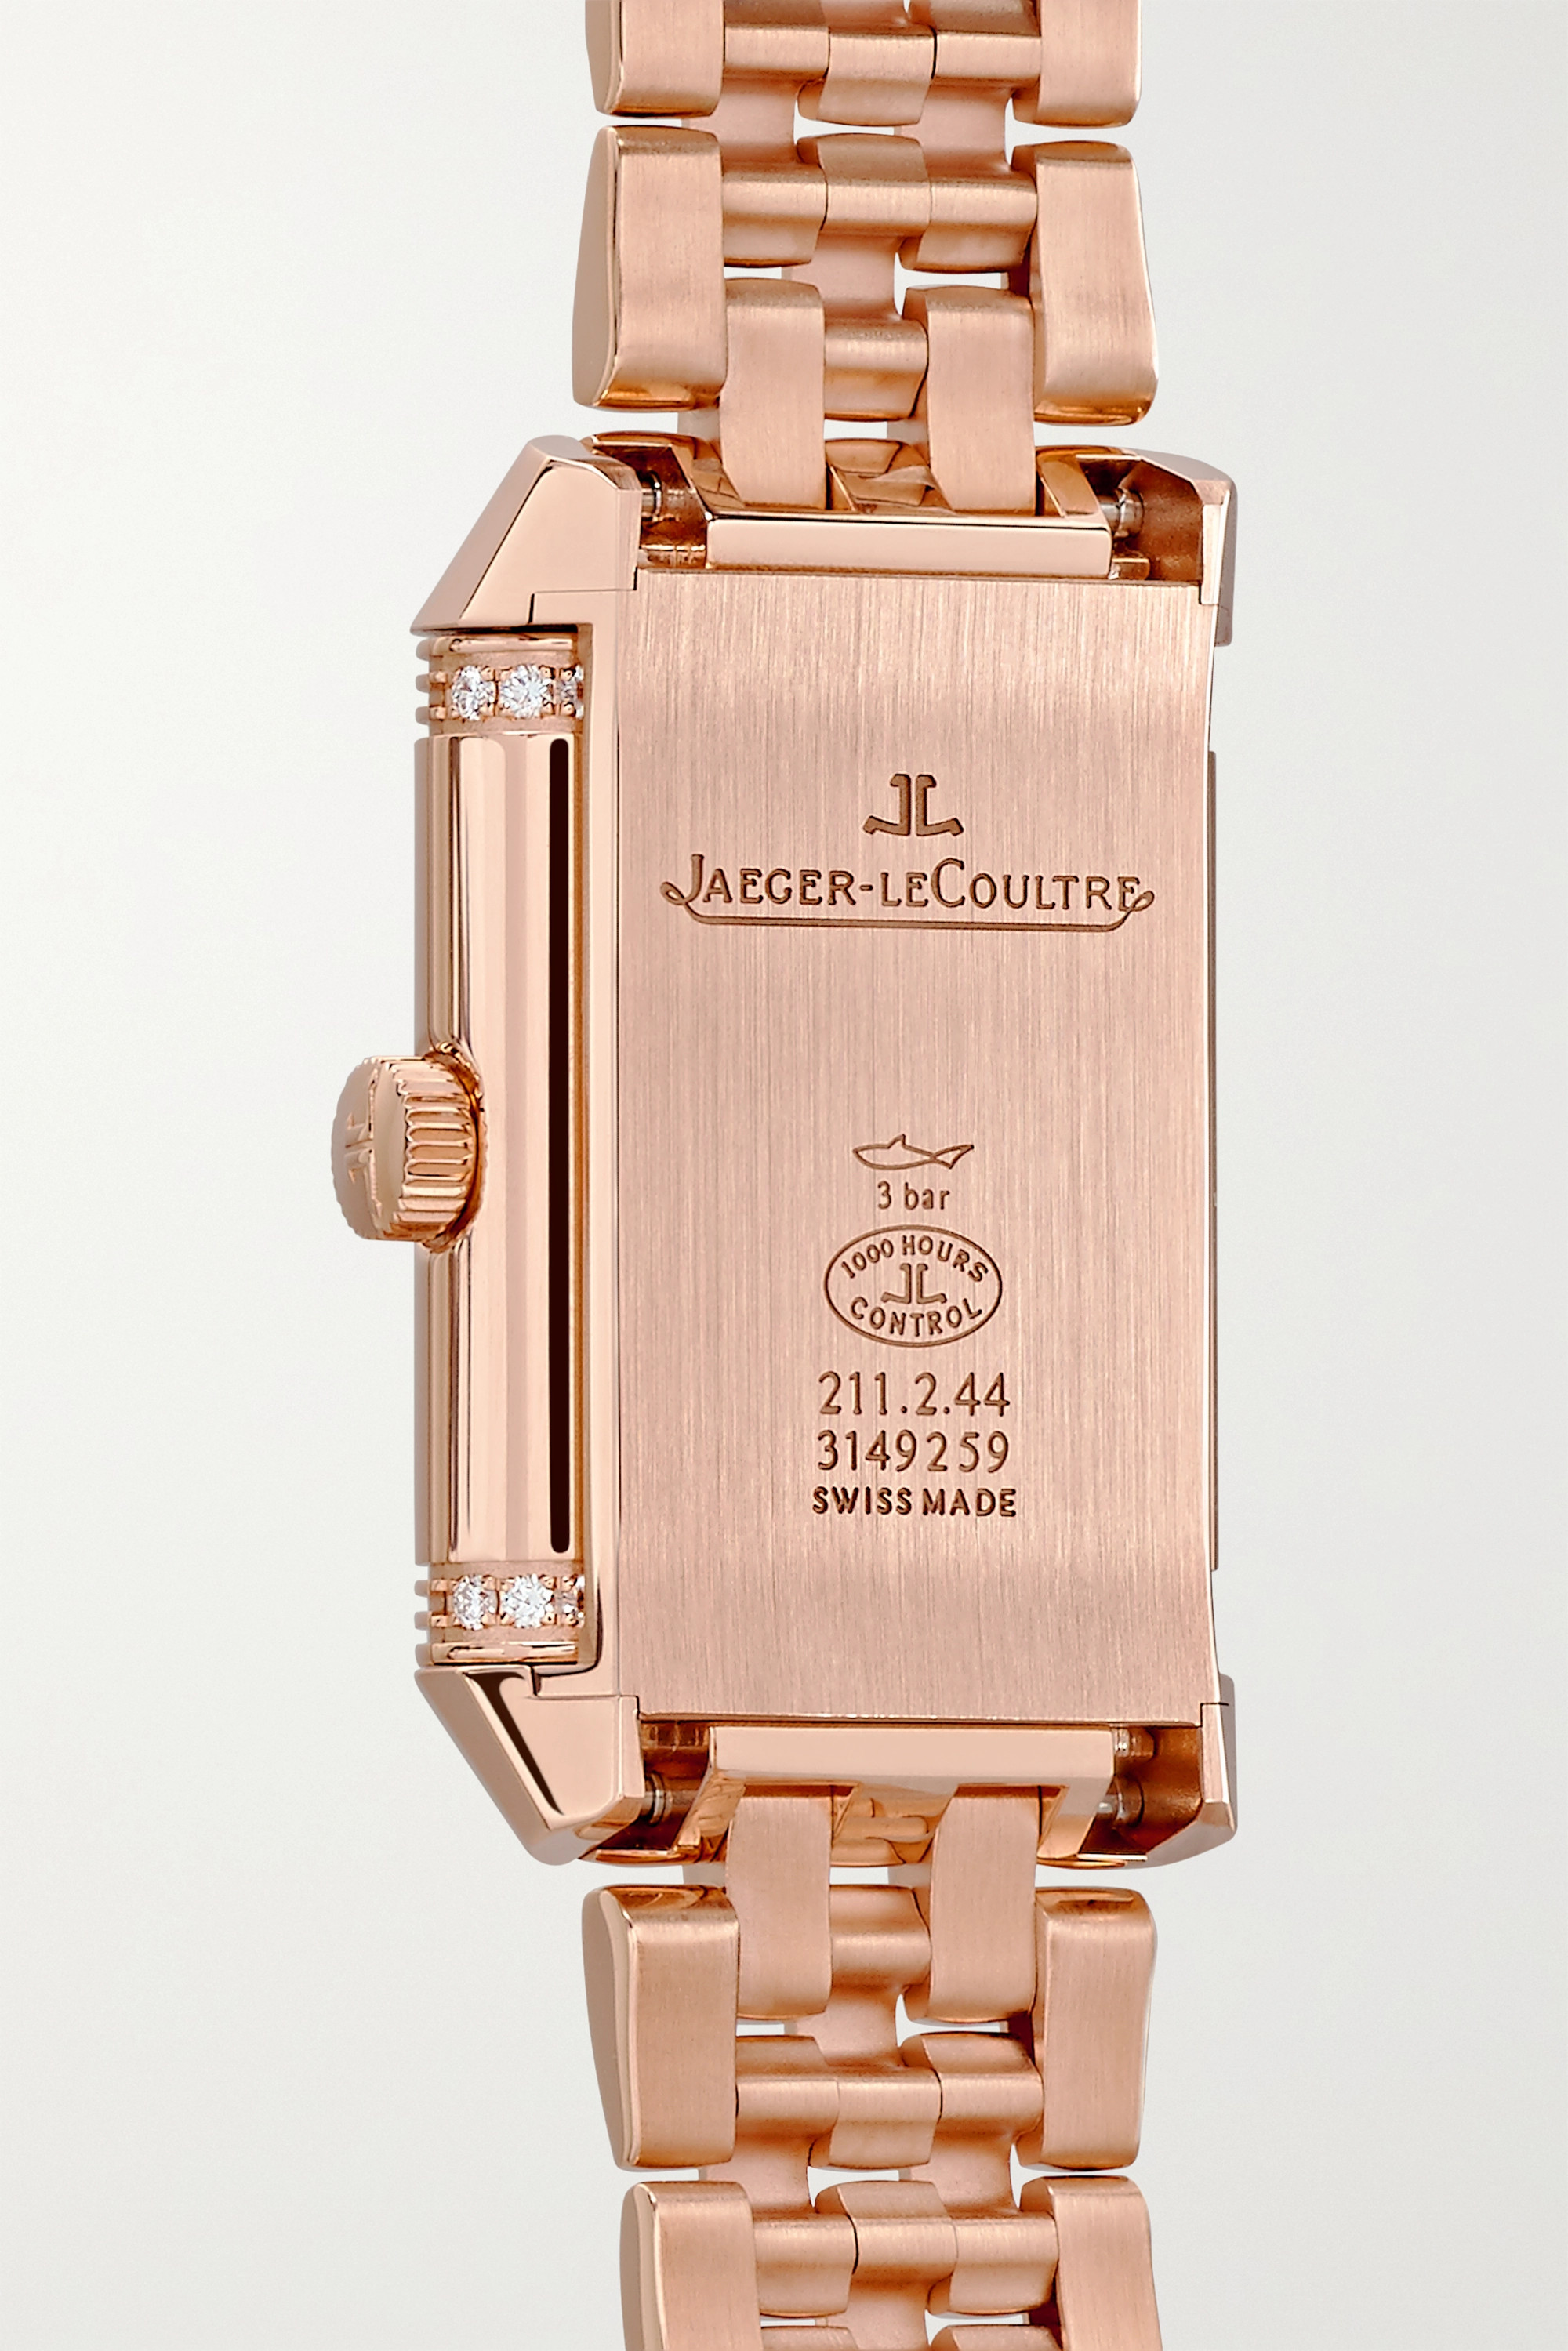 Jaeger-LeCoultre Reverso Classic Duetto 21 mm kleine Uhr aus Roségold mit Diamanten und Handaufzug